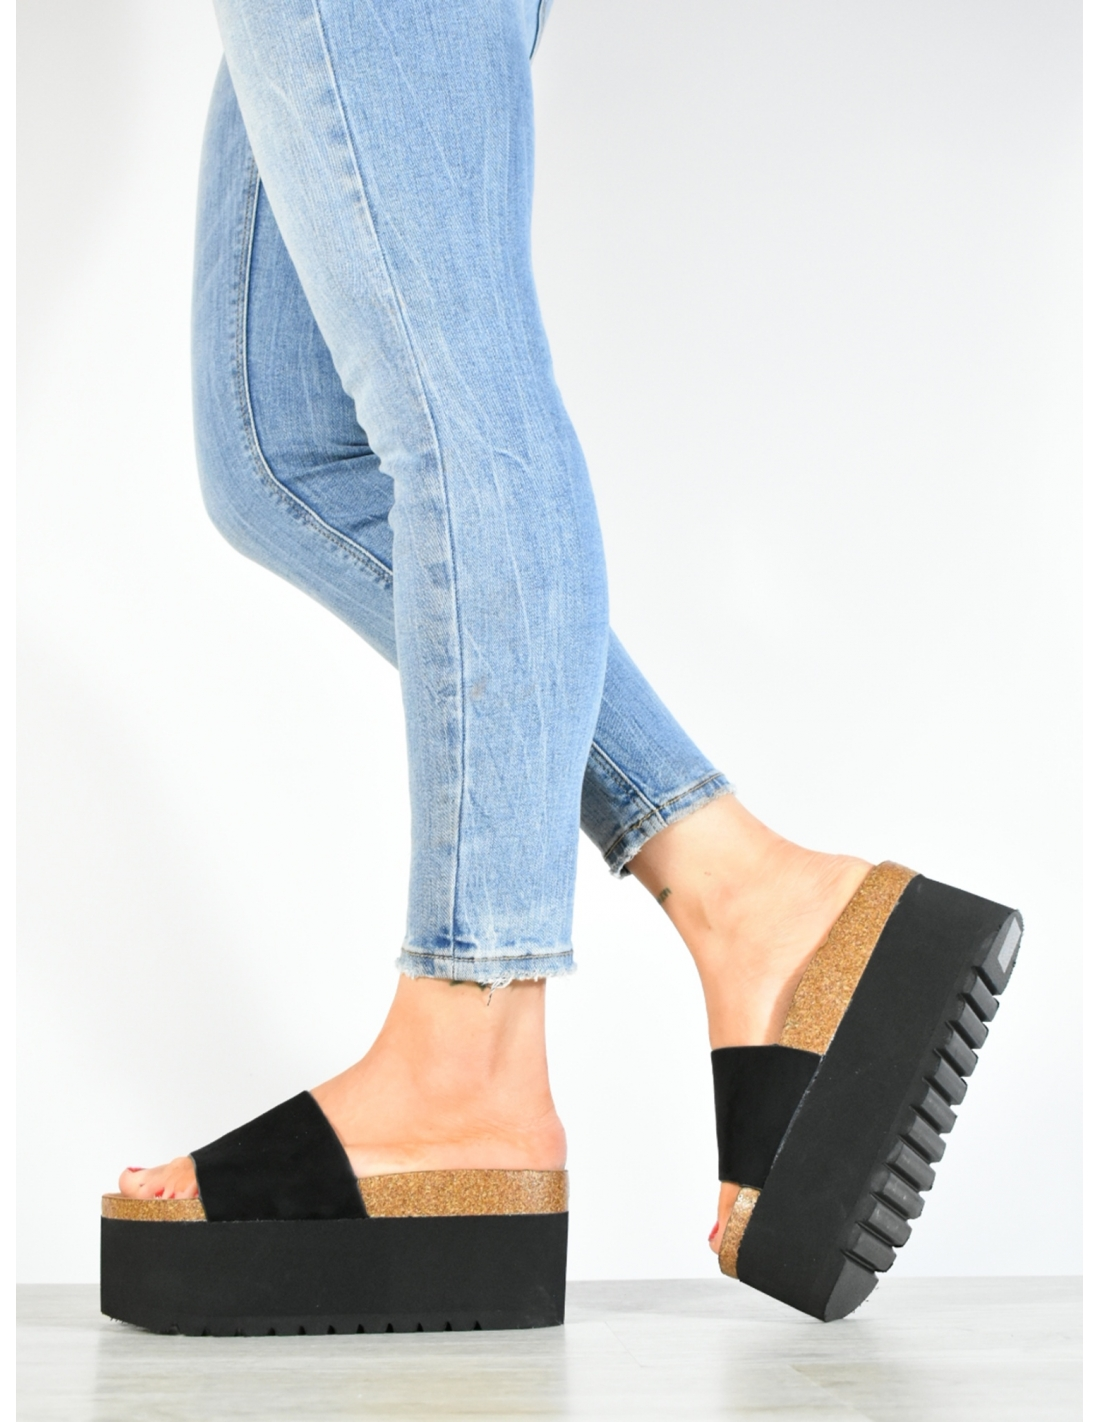 Sandalia basten negra